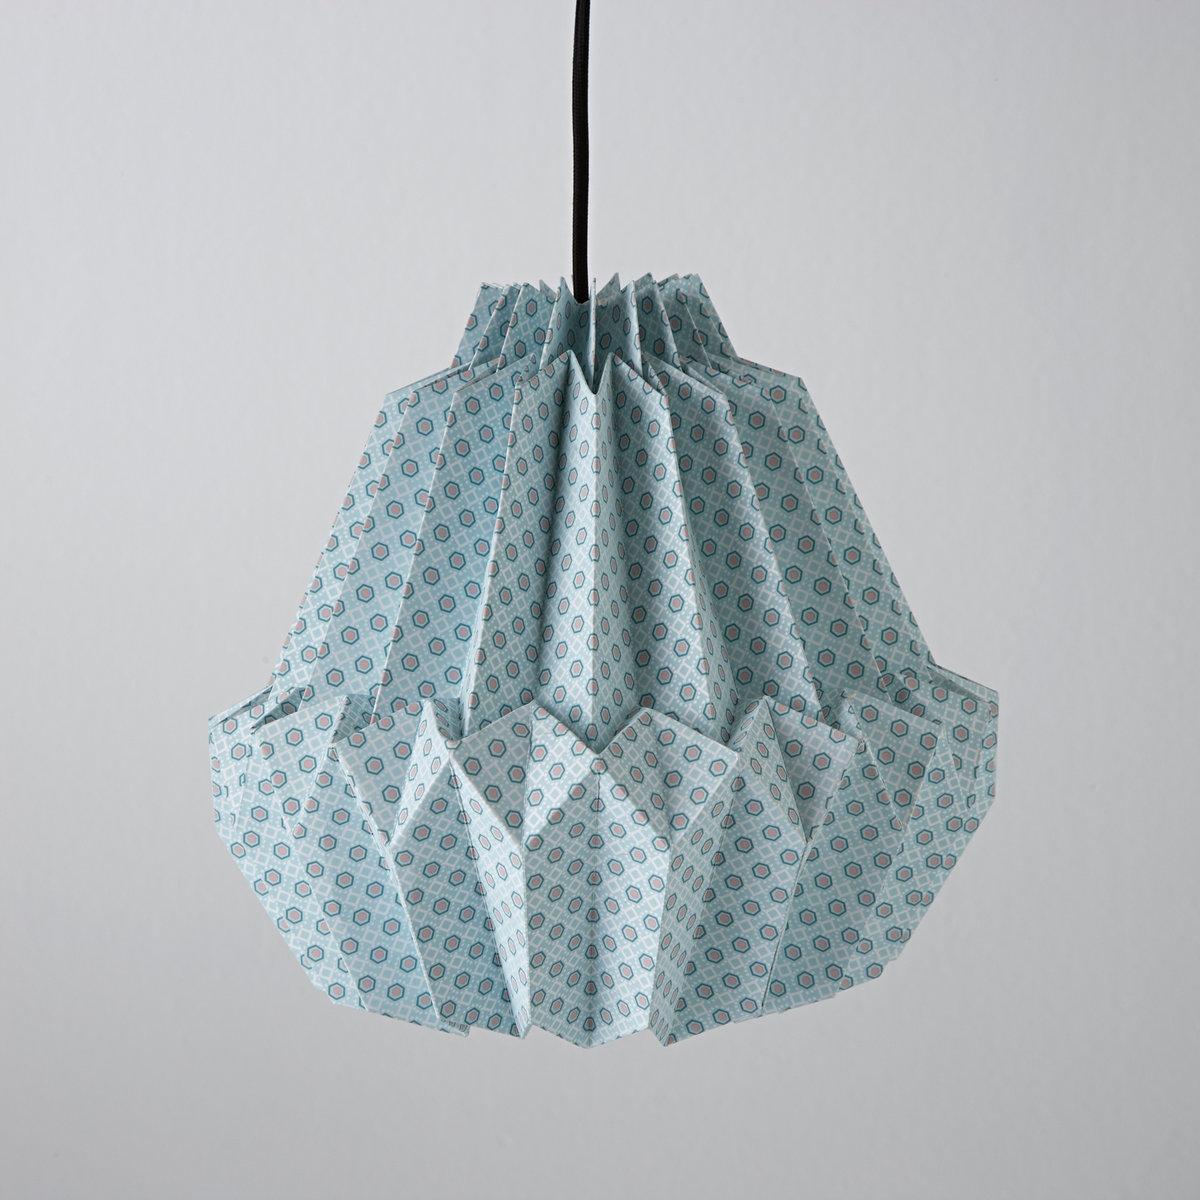 Светильник Shima от La Redoute